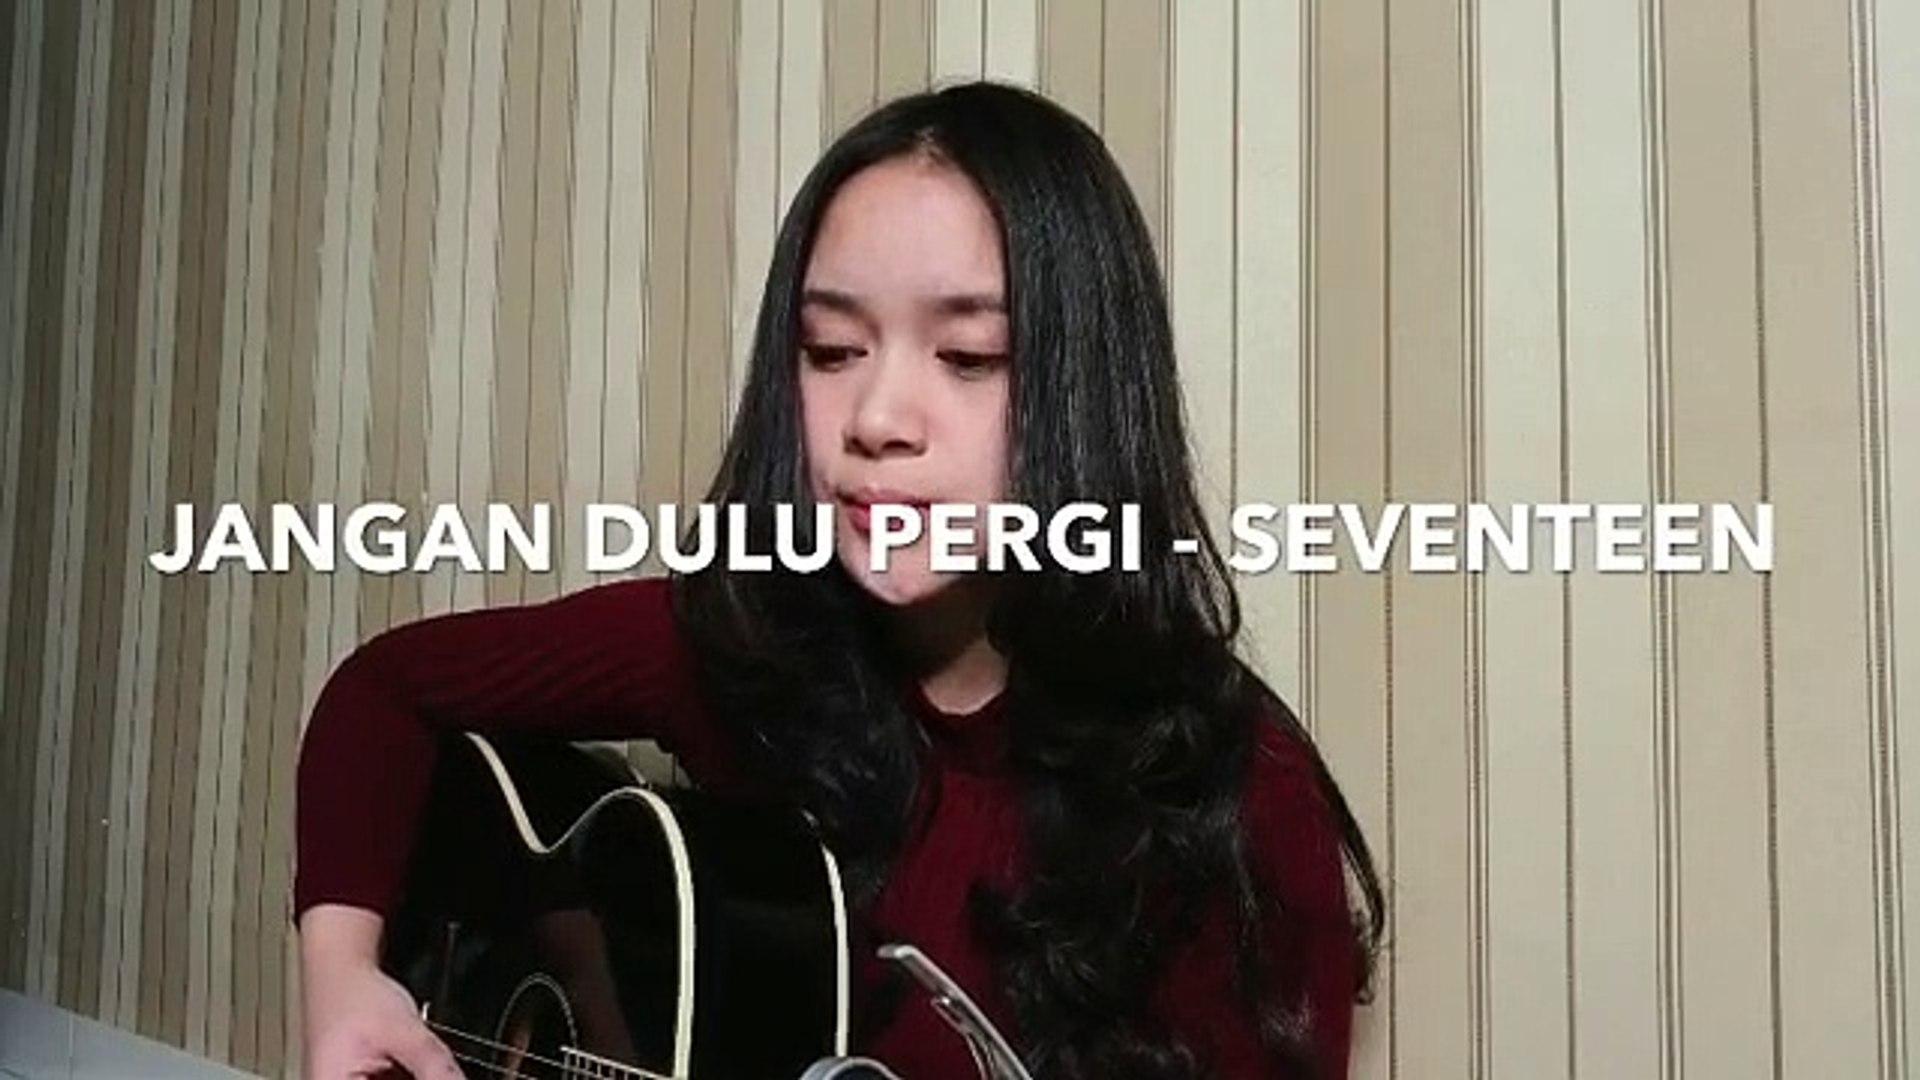 Cover Indonesia ! Jangan Dulu Pergi - Seventeen (Cover) Chintya Gabriella